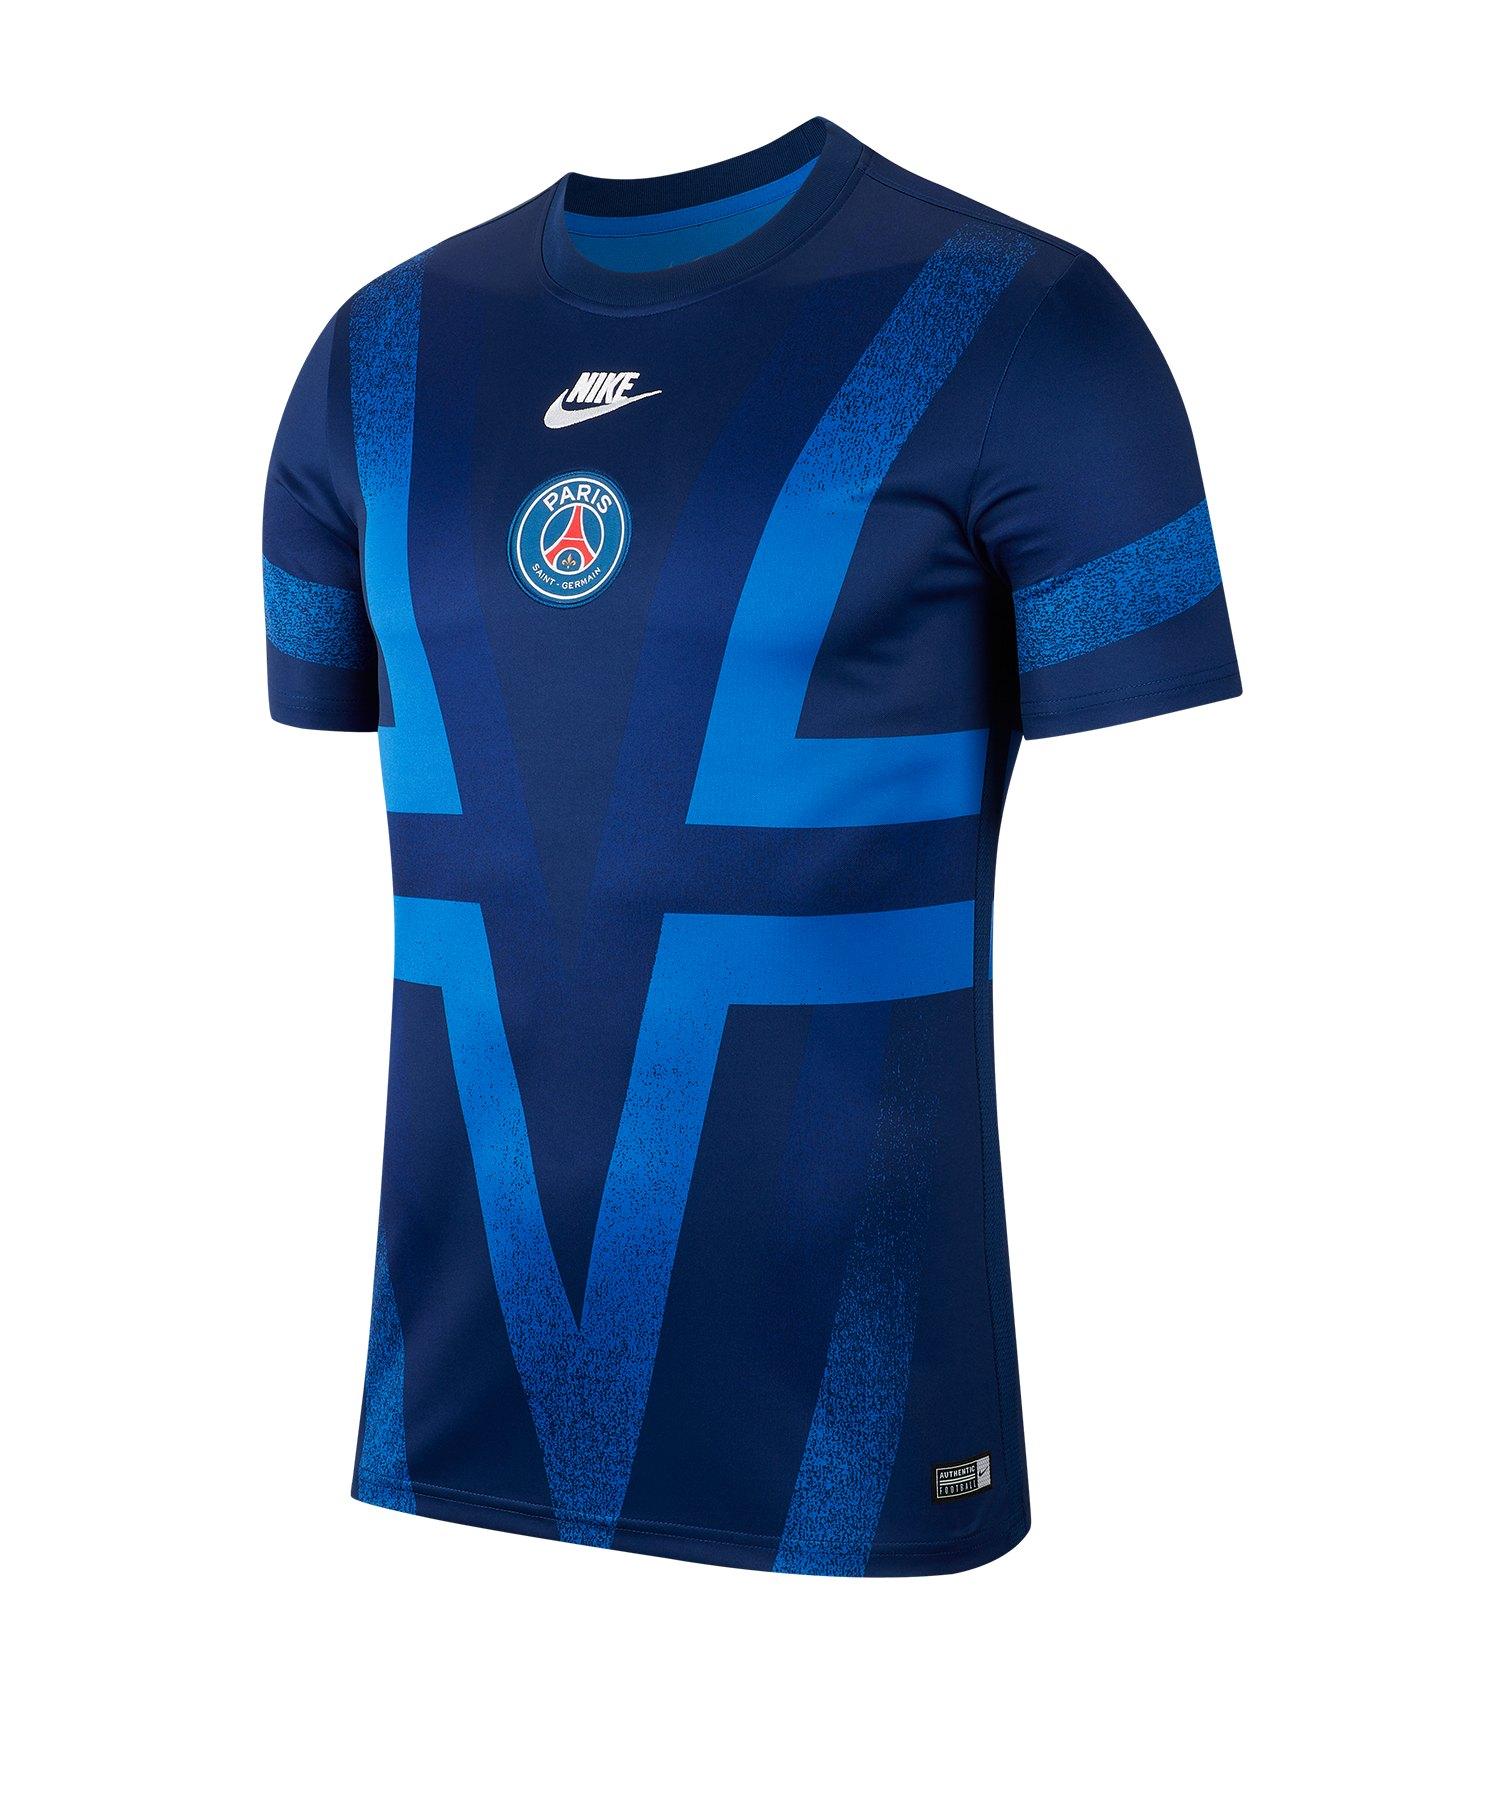 Nike Paris St. Germain Dry Top T-Shirt CL F496 - blau